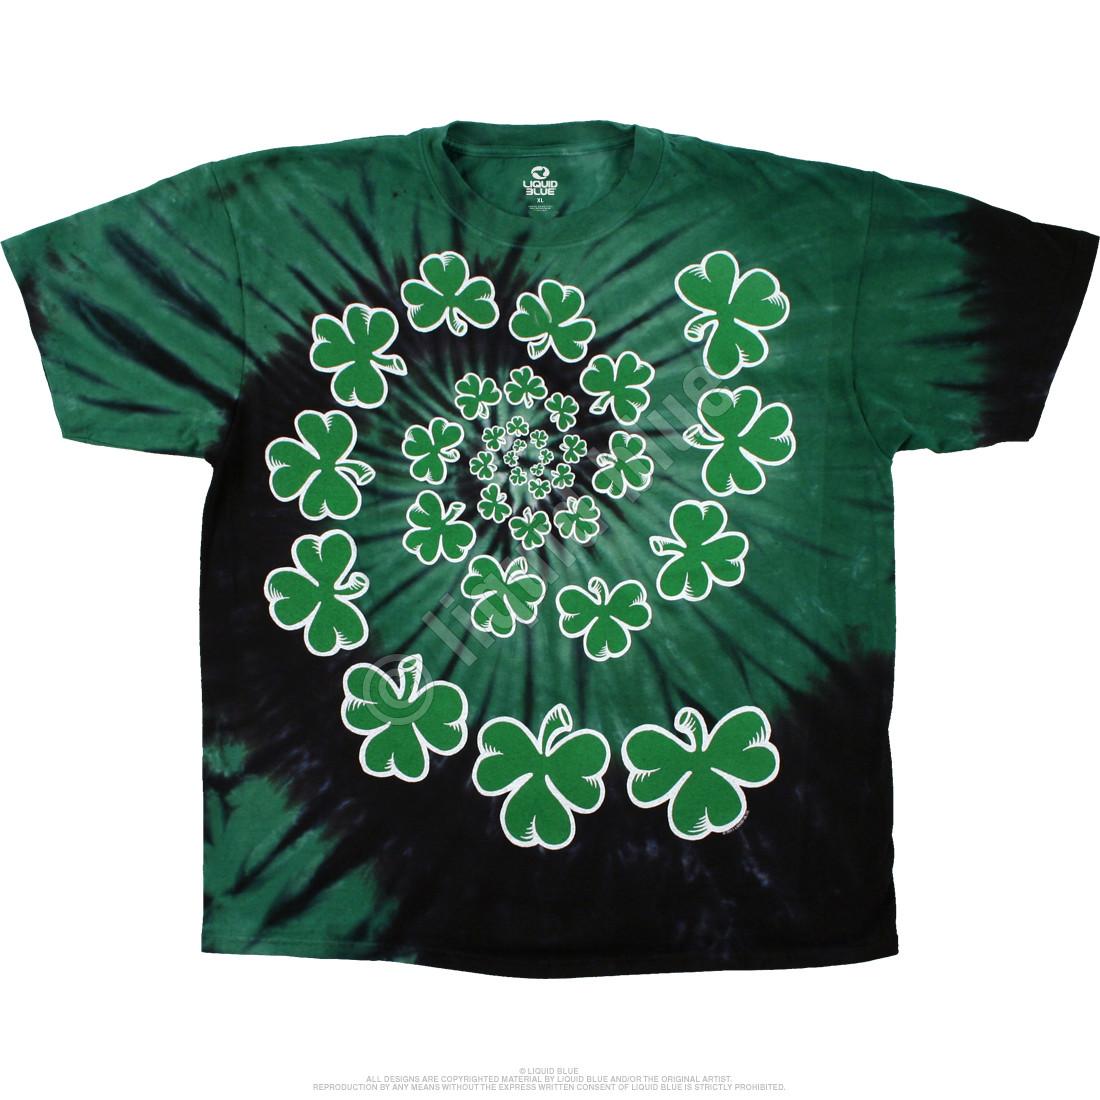 Shamrock Spiral Tie-Dye T-Shirt